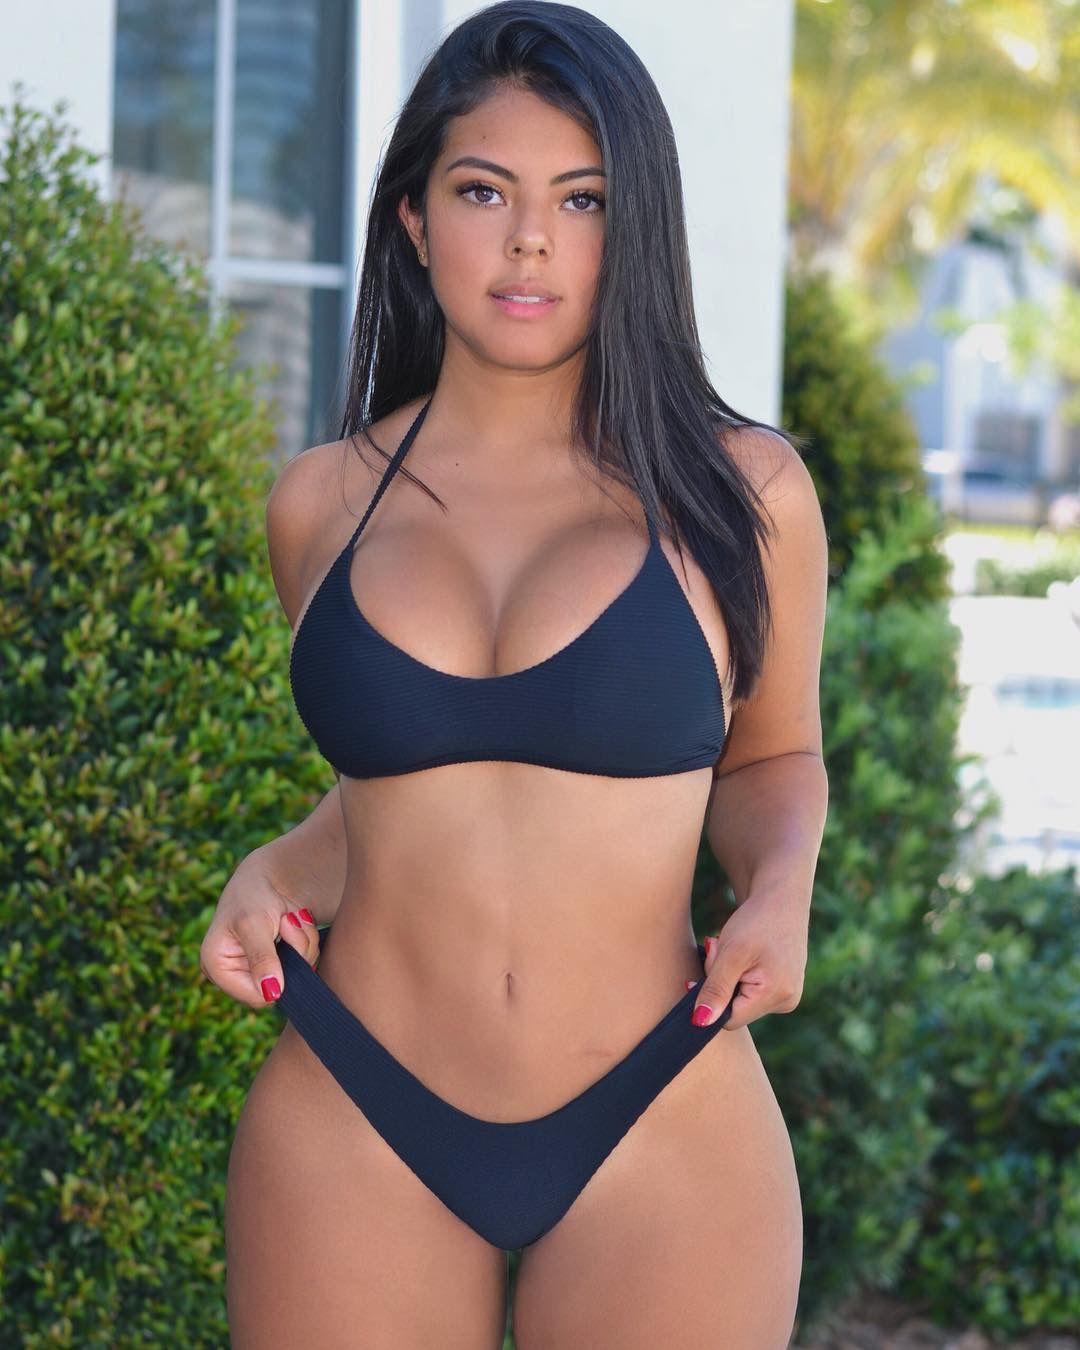 Bikini Larissa Heard nude (98 photo), Tits, Is a cute, Boobs, butt 2019